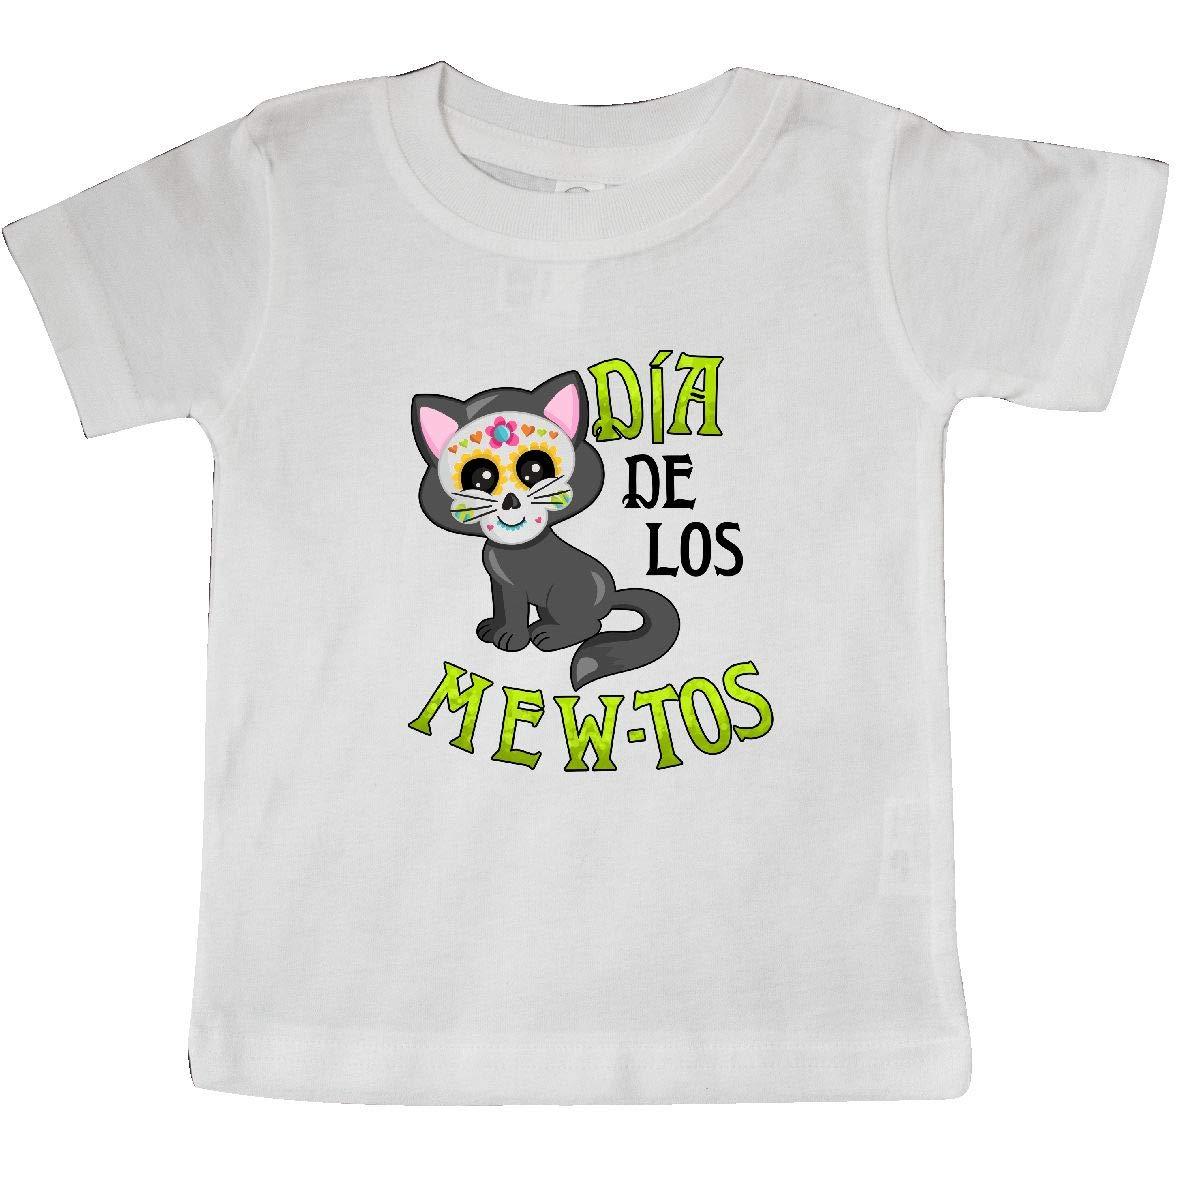 inktastic D/ía De Los Mew-TOS Day of The Dead Cat Baby T-Shirt